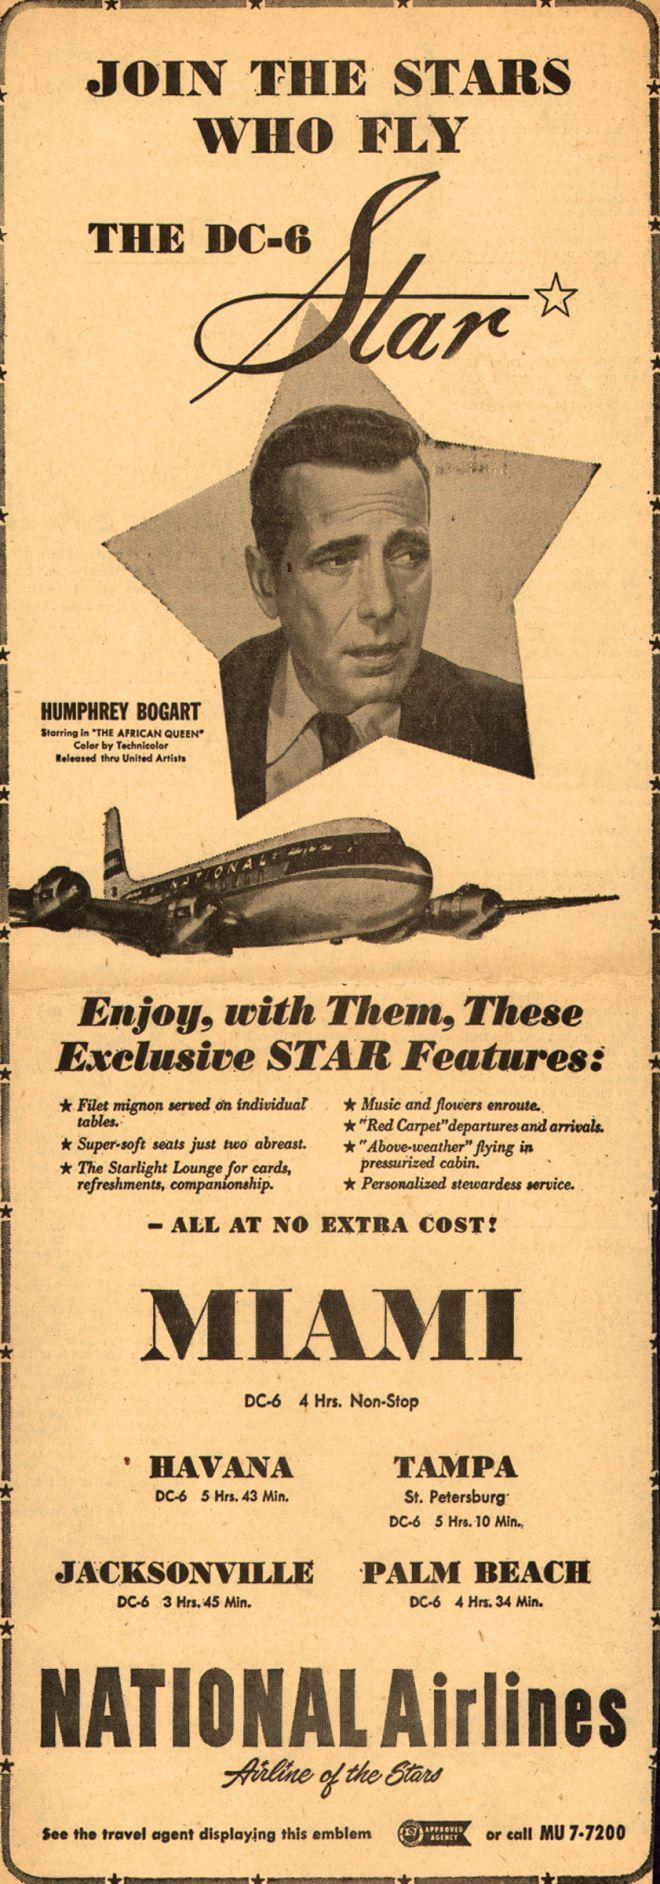 0 humphrey bogart - dc-6 star national airlines ad